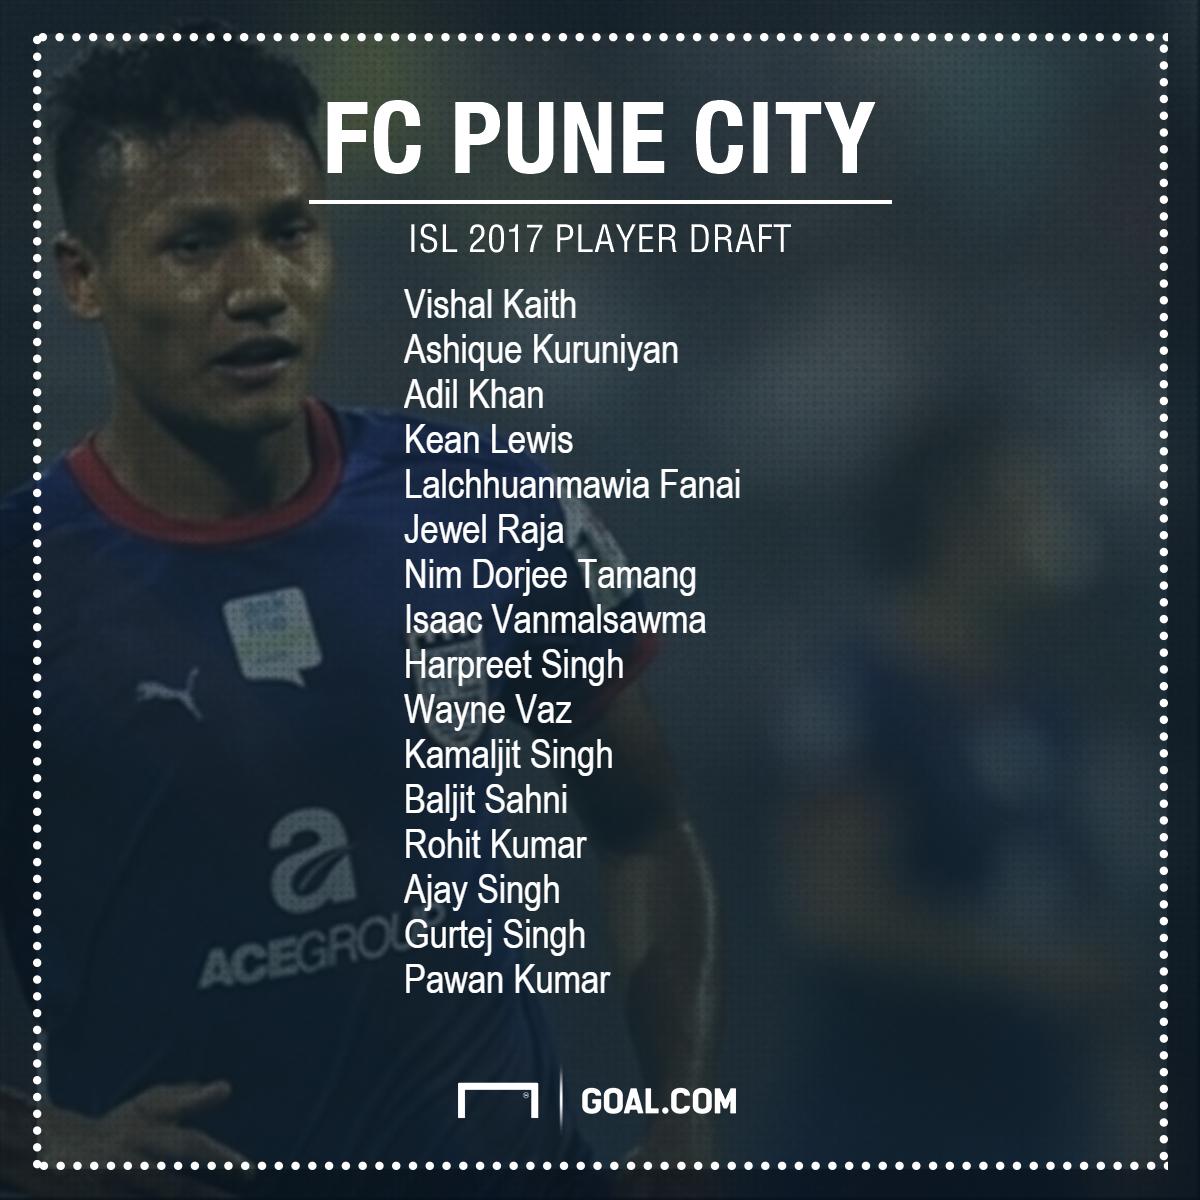 FC Pune City Draft